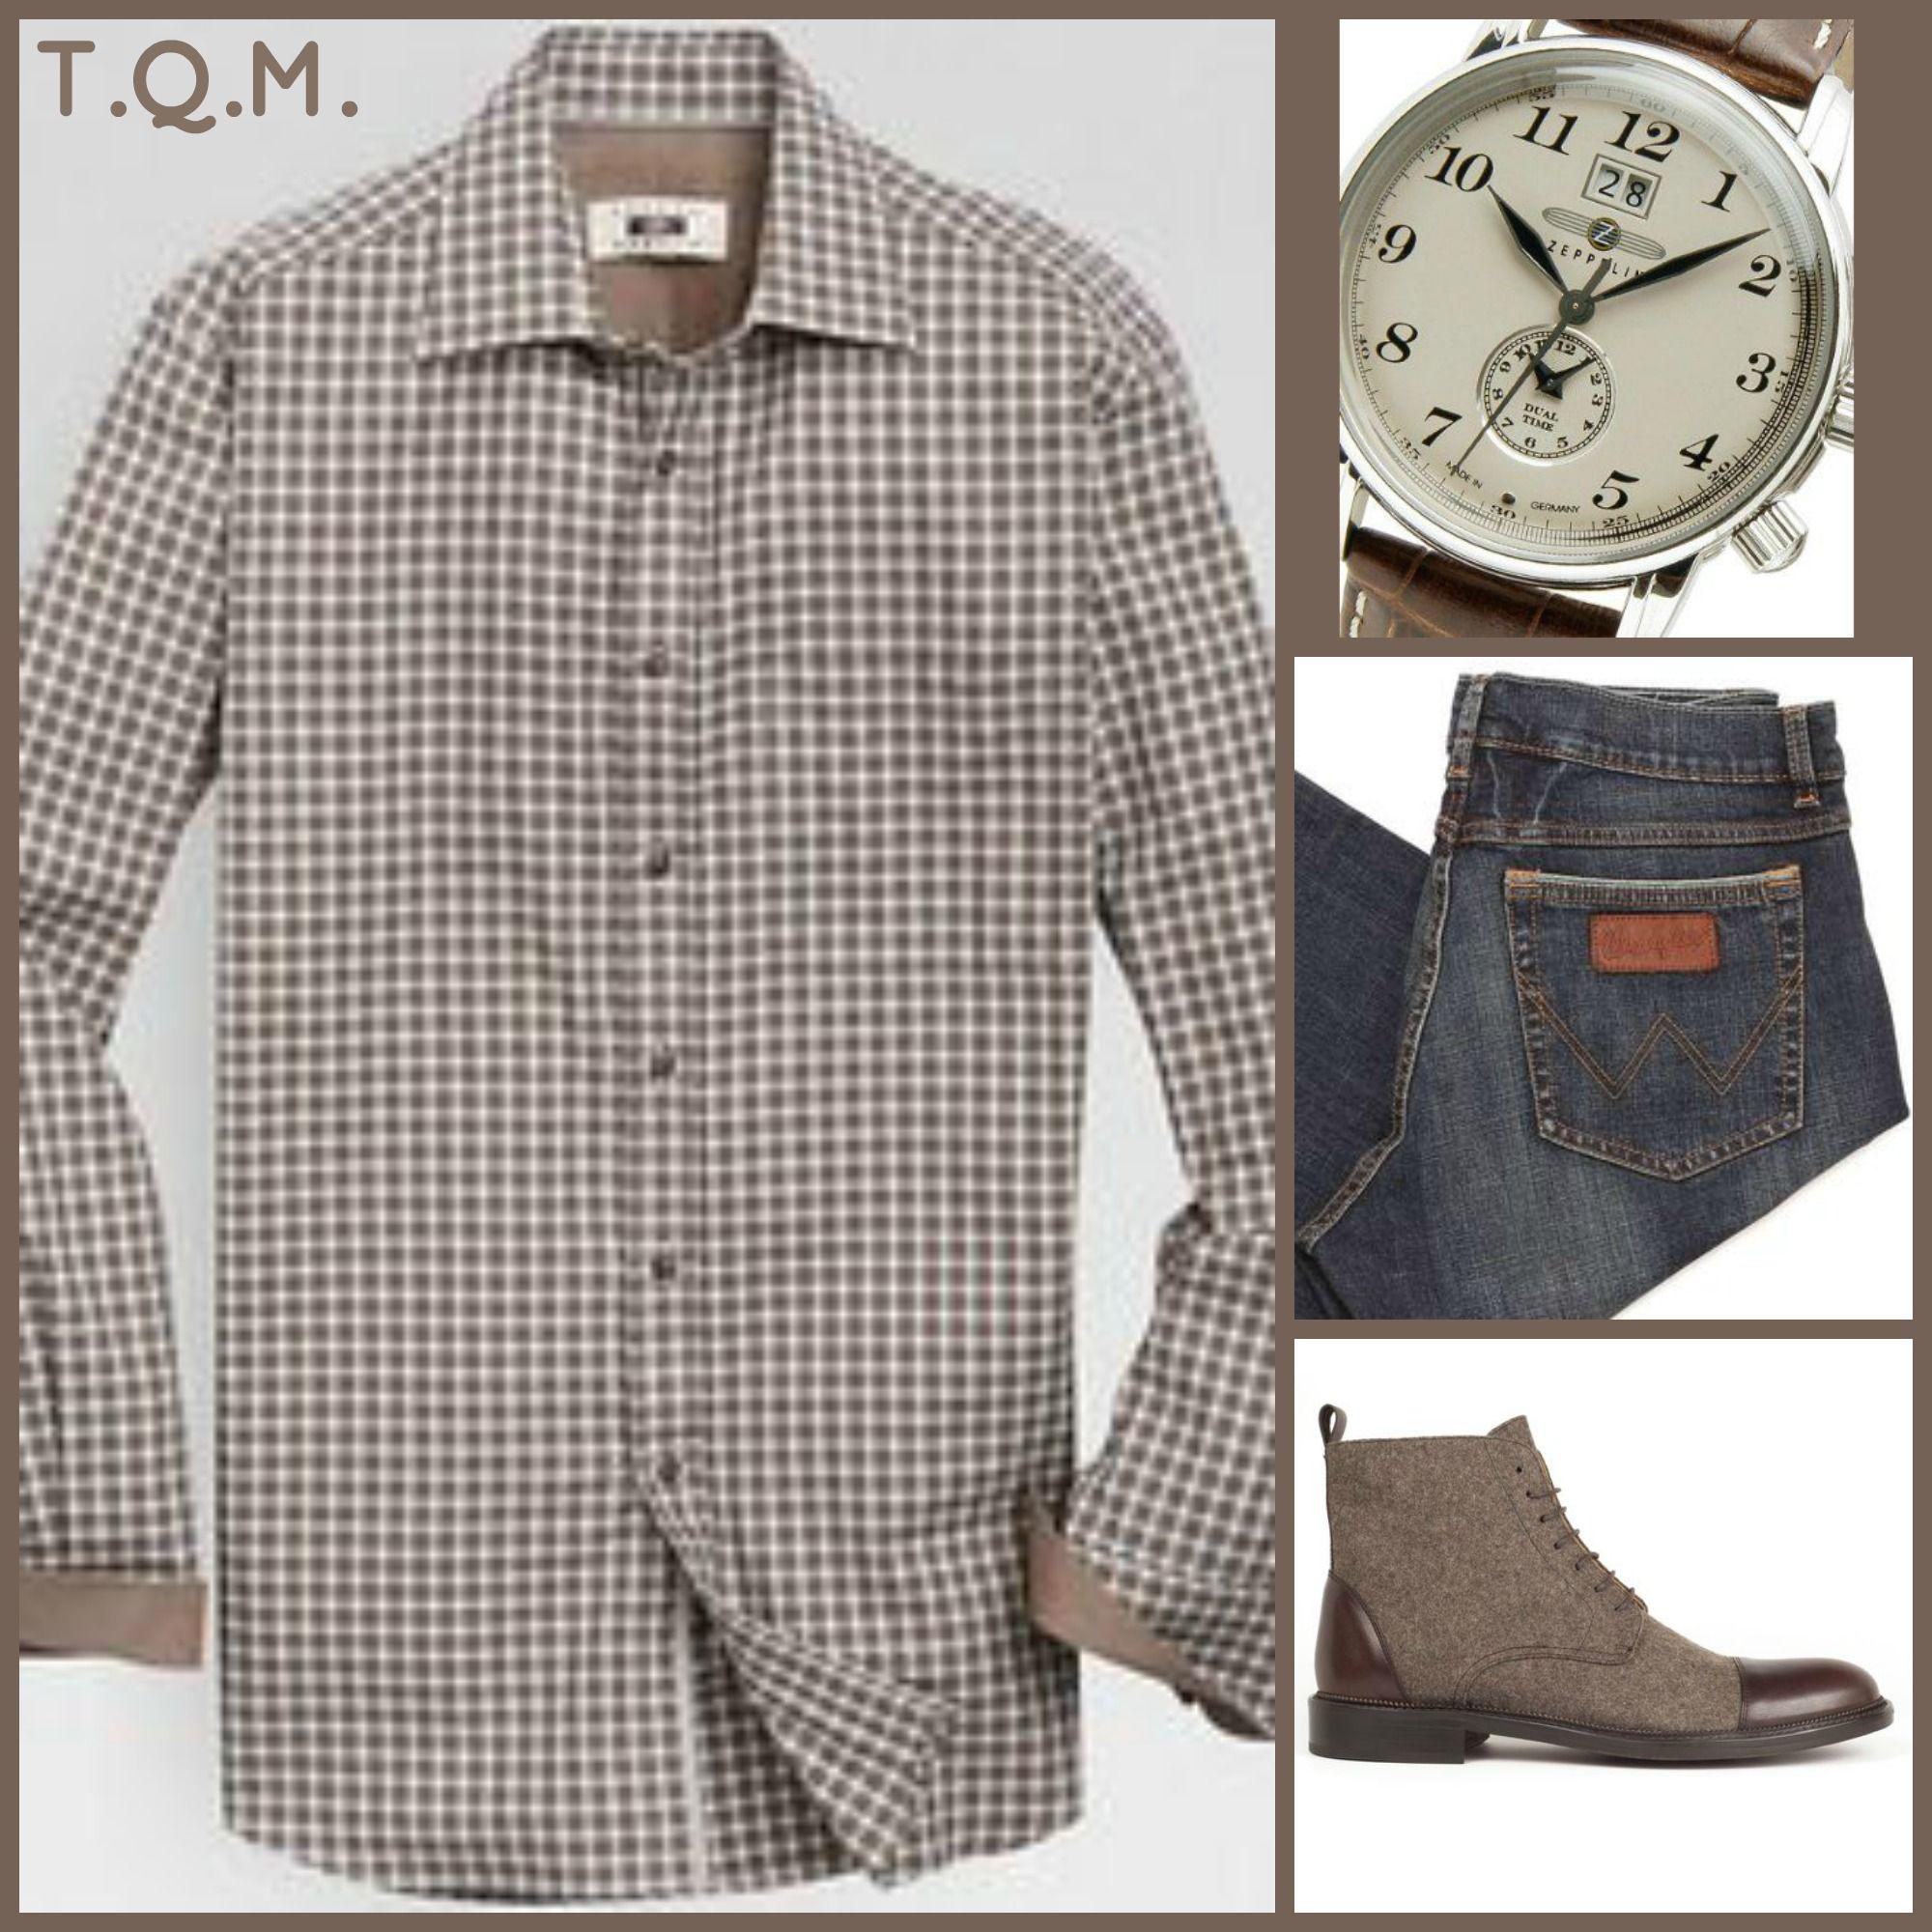 WEEKEND(JEAN STYLE): Joseph Abbound(Shirt)-Zeppelin(Watch)-Wrangler(Jeans)-Taft(Boot)